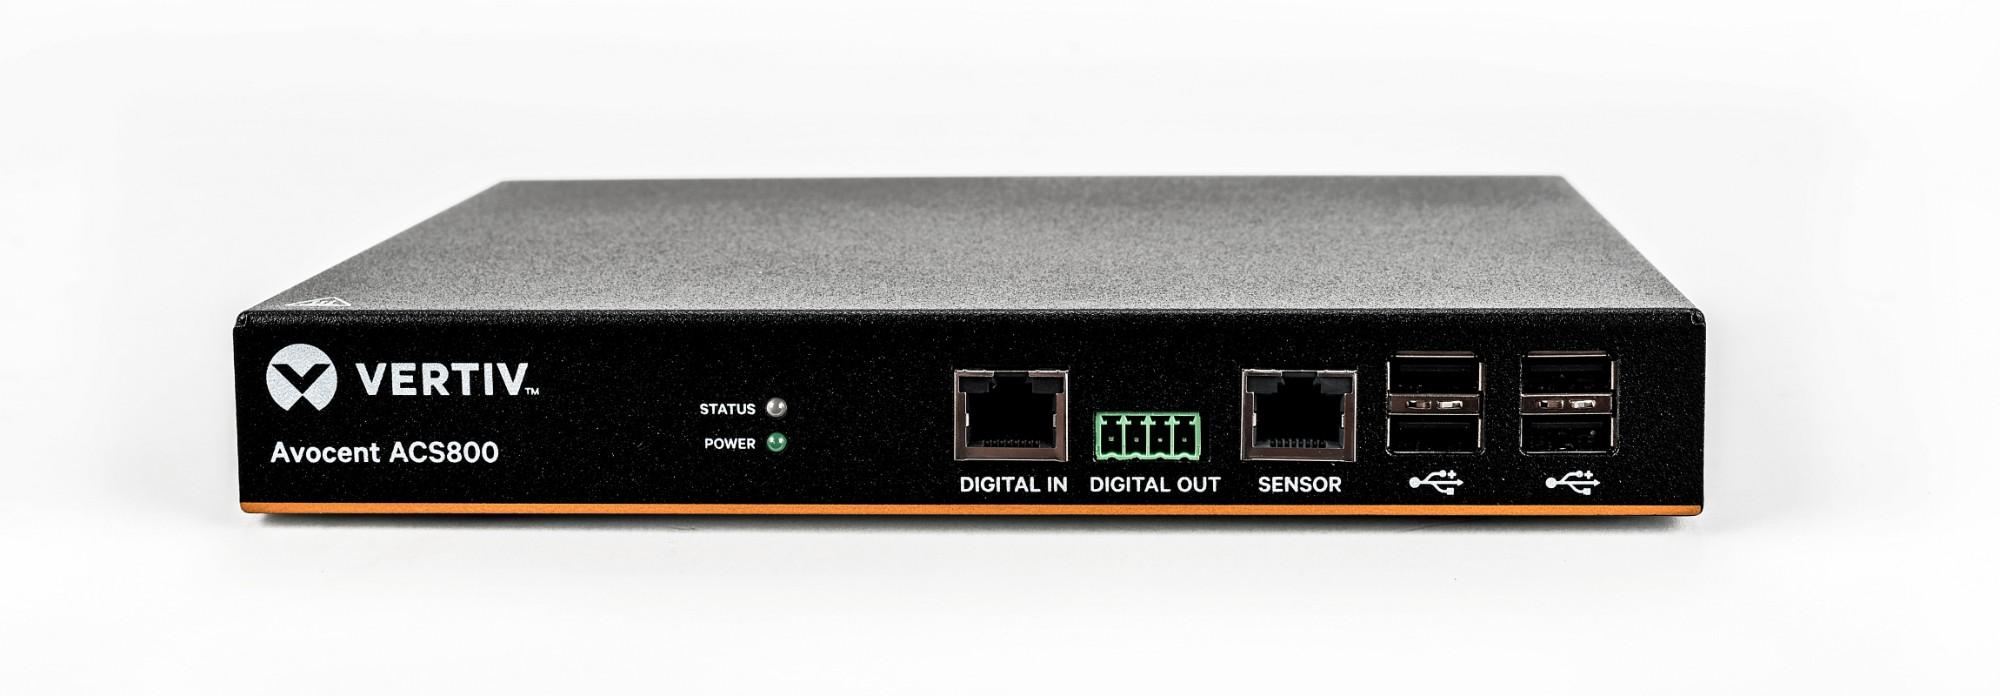 Vertiv Avocent 2-Port ACS800 Serial Console with external AC/DC Power Brick - UK power cord: Plug CE